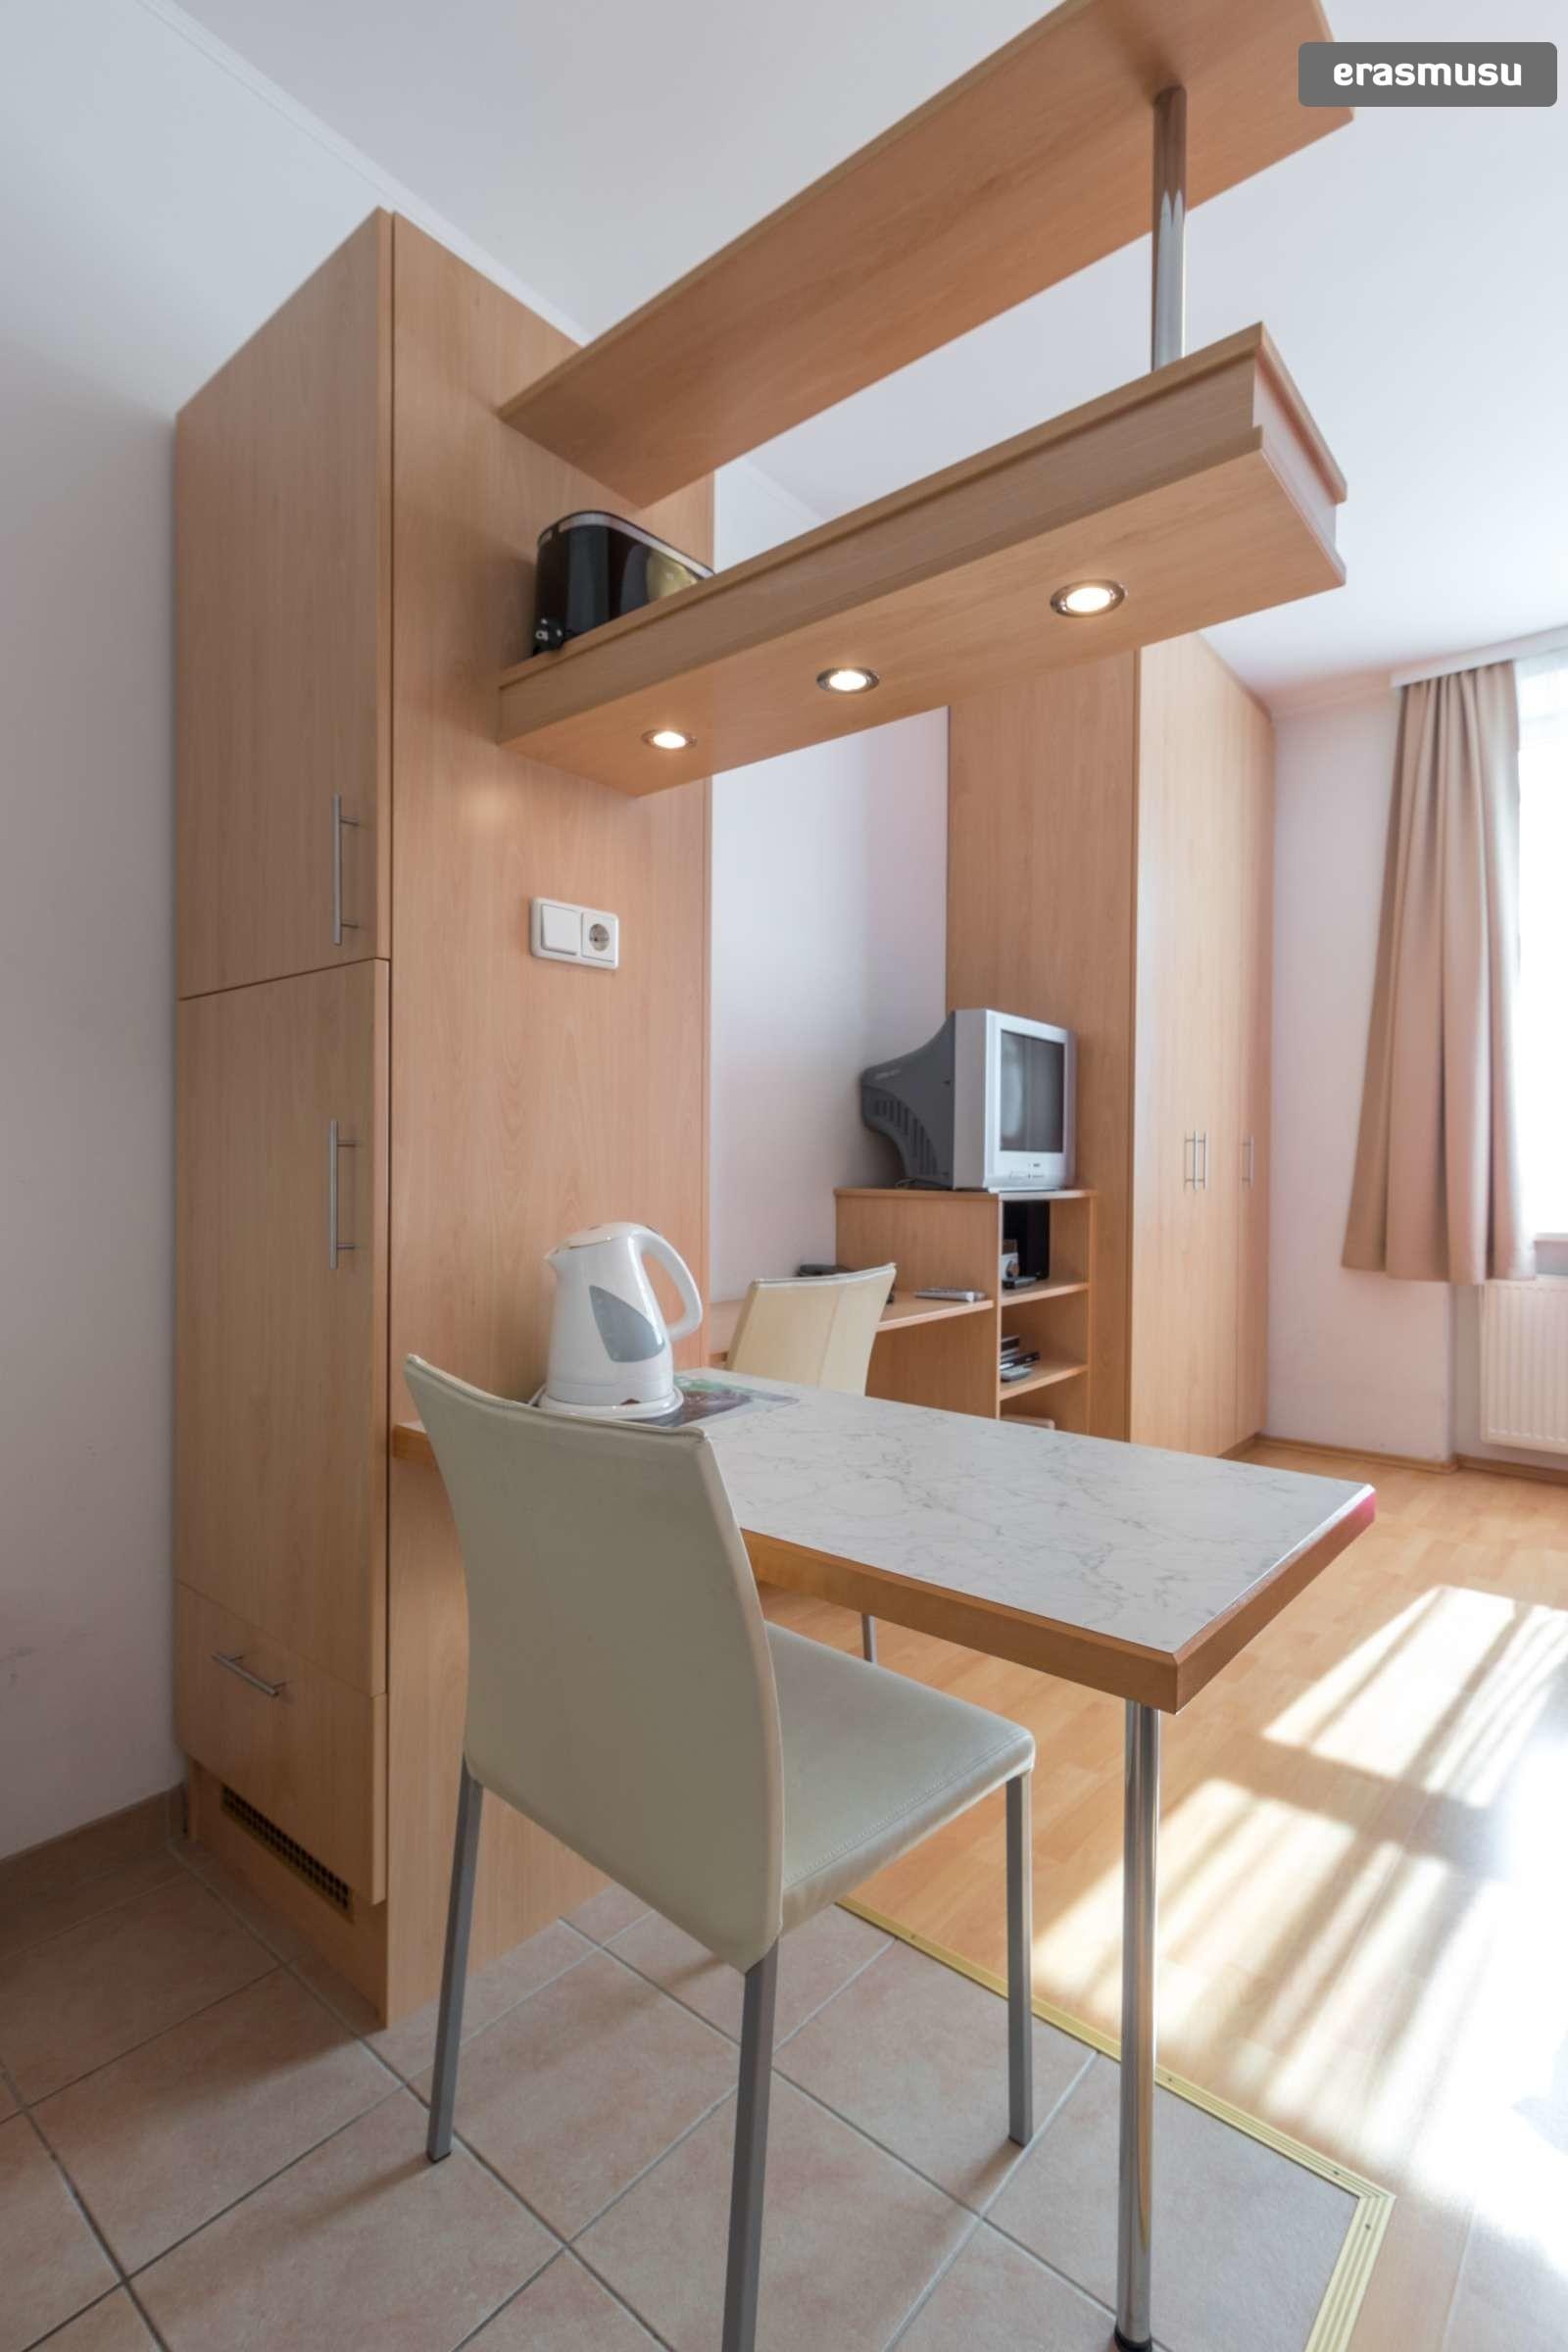 sunny-studio-apartment-rent-near-bohemian-prater-favoriten-5744e